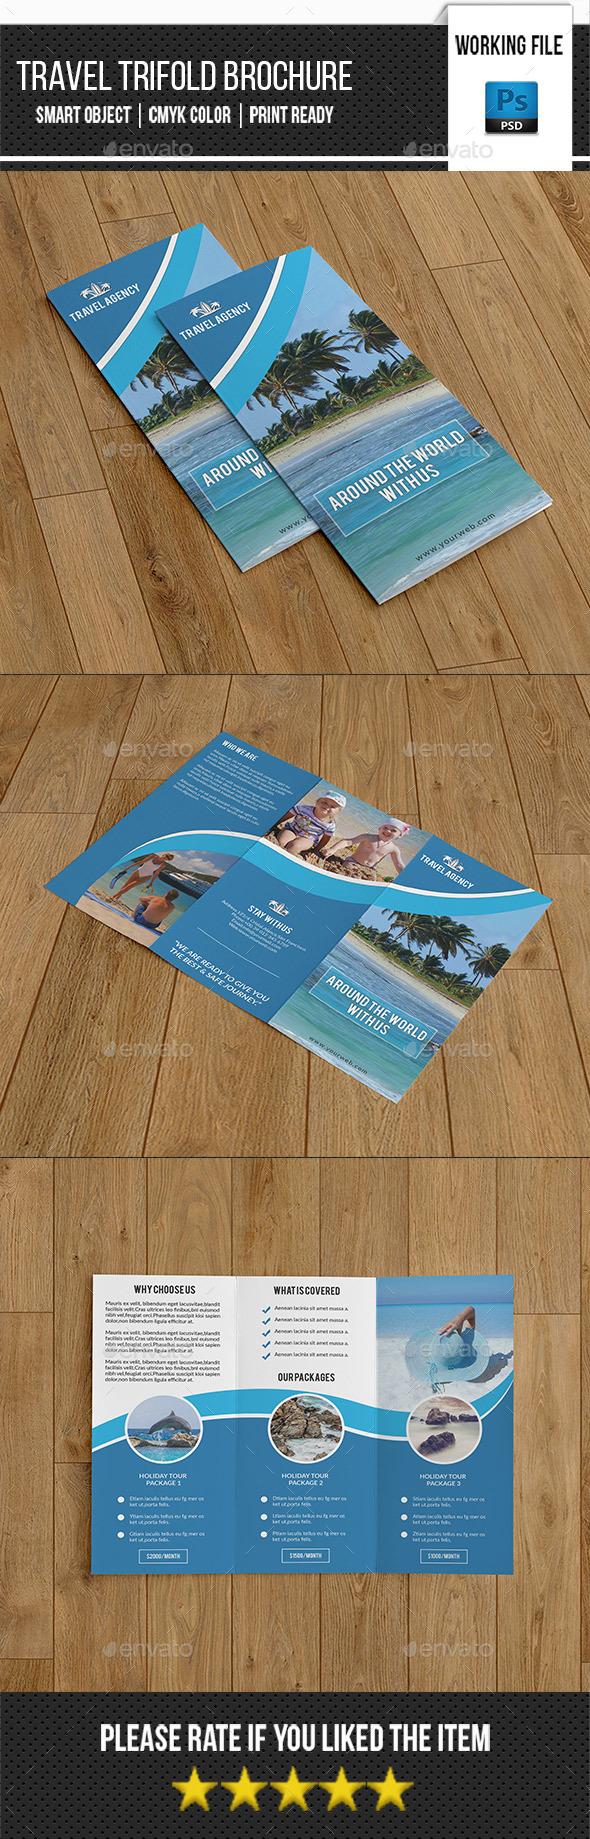 Travel Trifold Brochure-V284 - Corporate Brochures